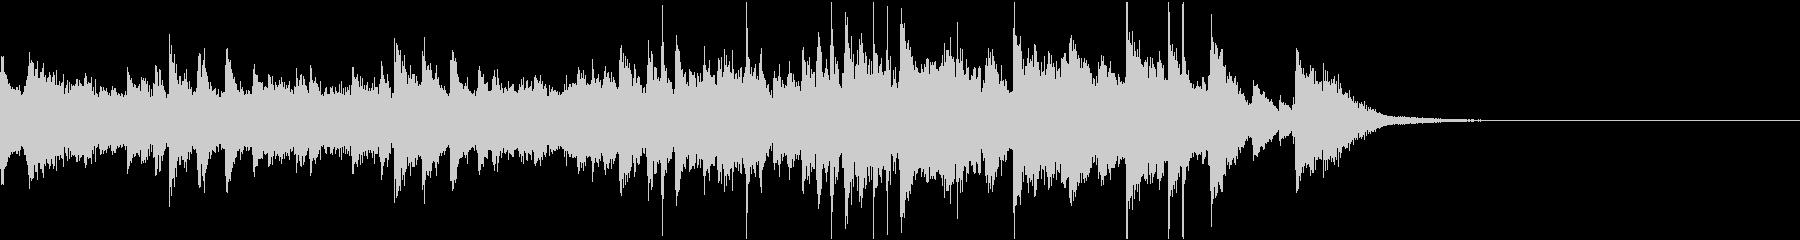 Refreshing violin / jingle's unreproduced waveform